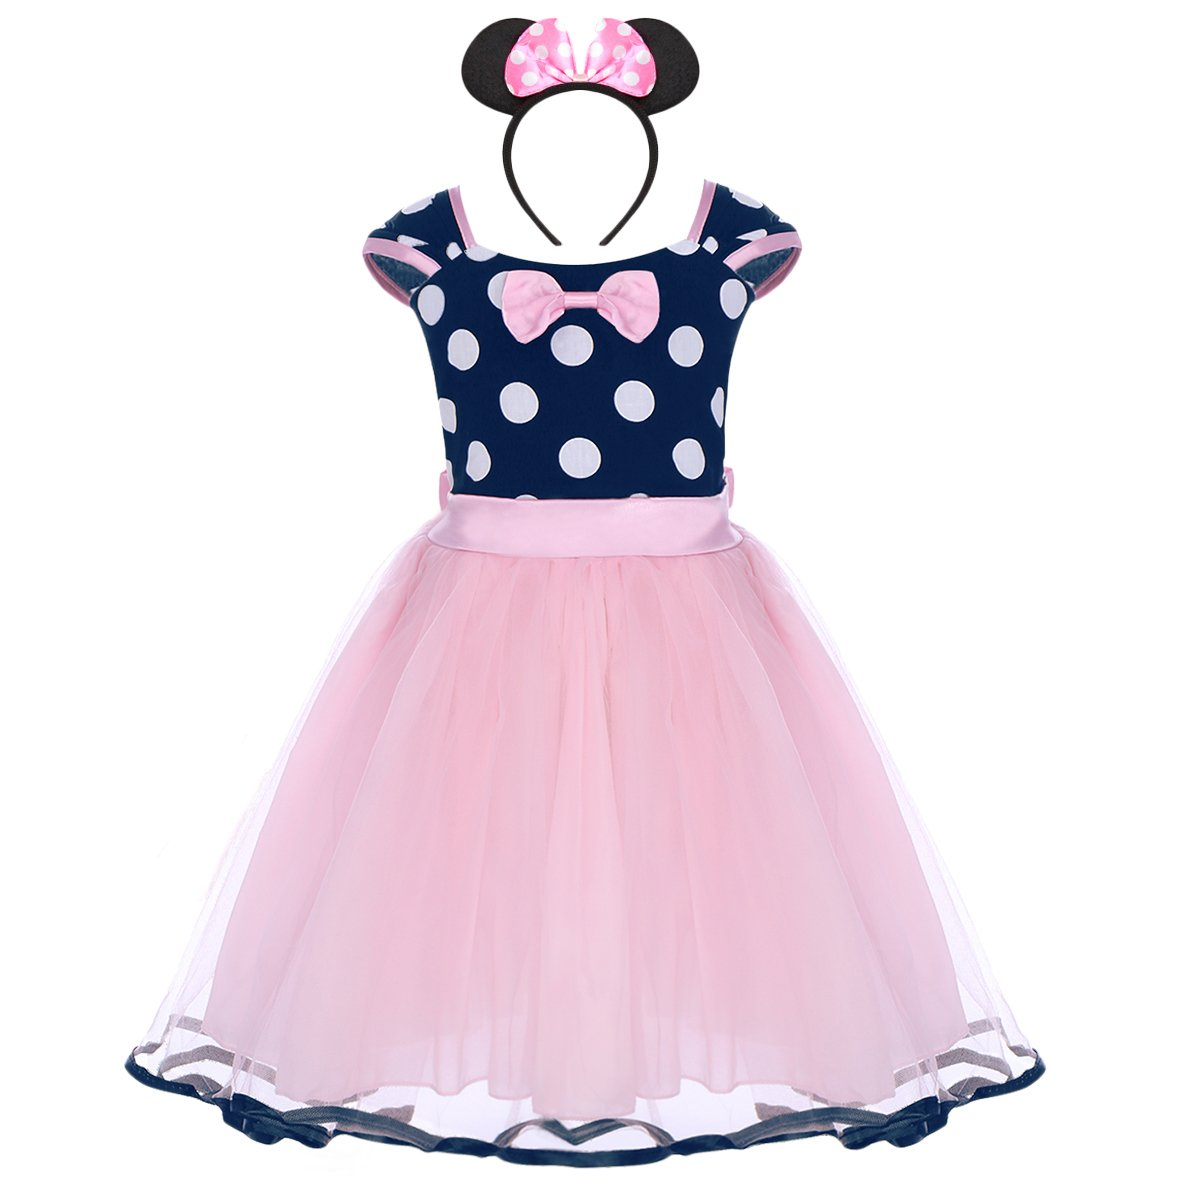 Kids Girls Halloween Party Costume Toddler Polka Dots Bowknot Princess Dress Costumes, Reenactment, Theater